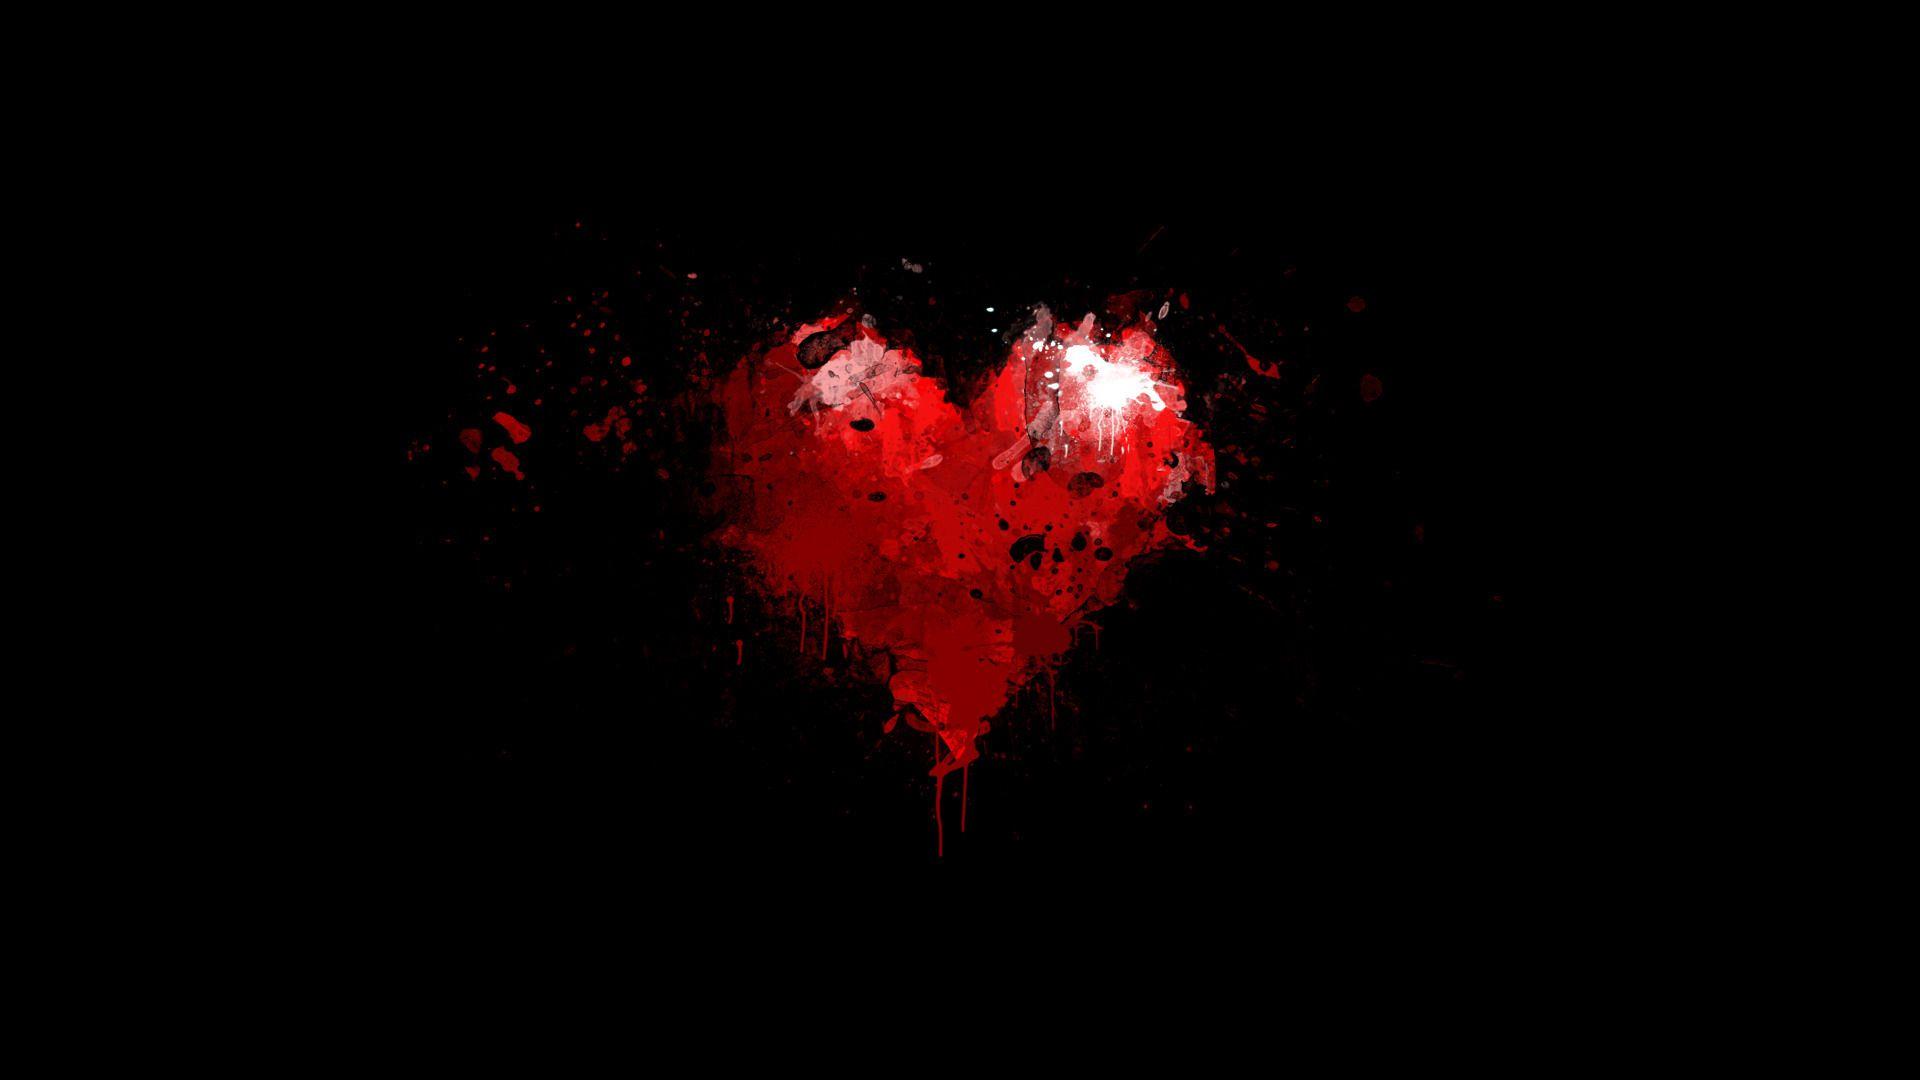 Hd wallpaper dark night - Painted Red Heart On Black Background Widescreen Wallpaper